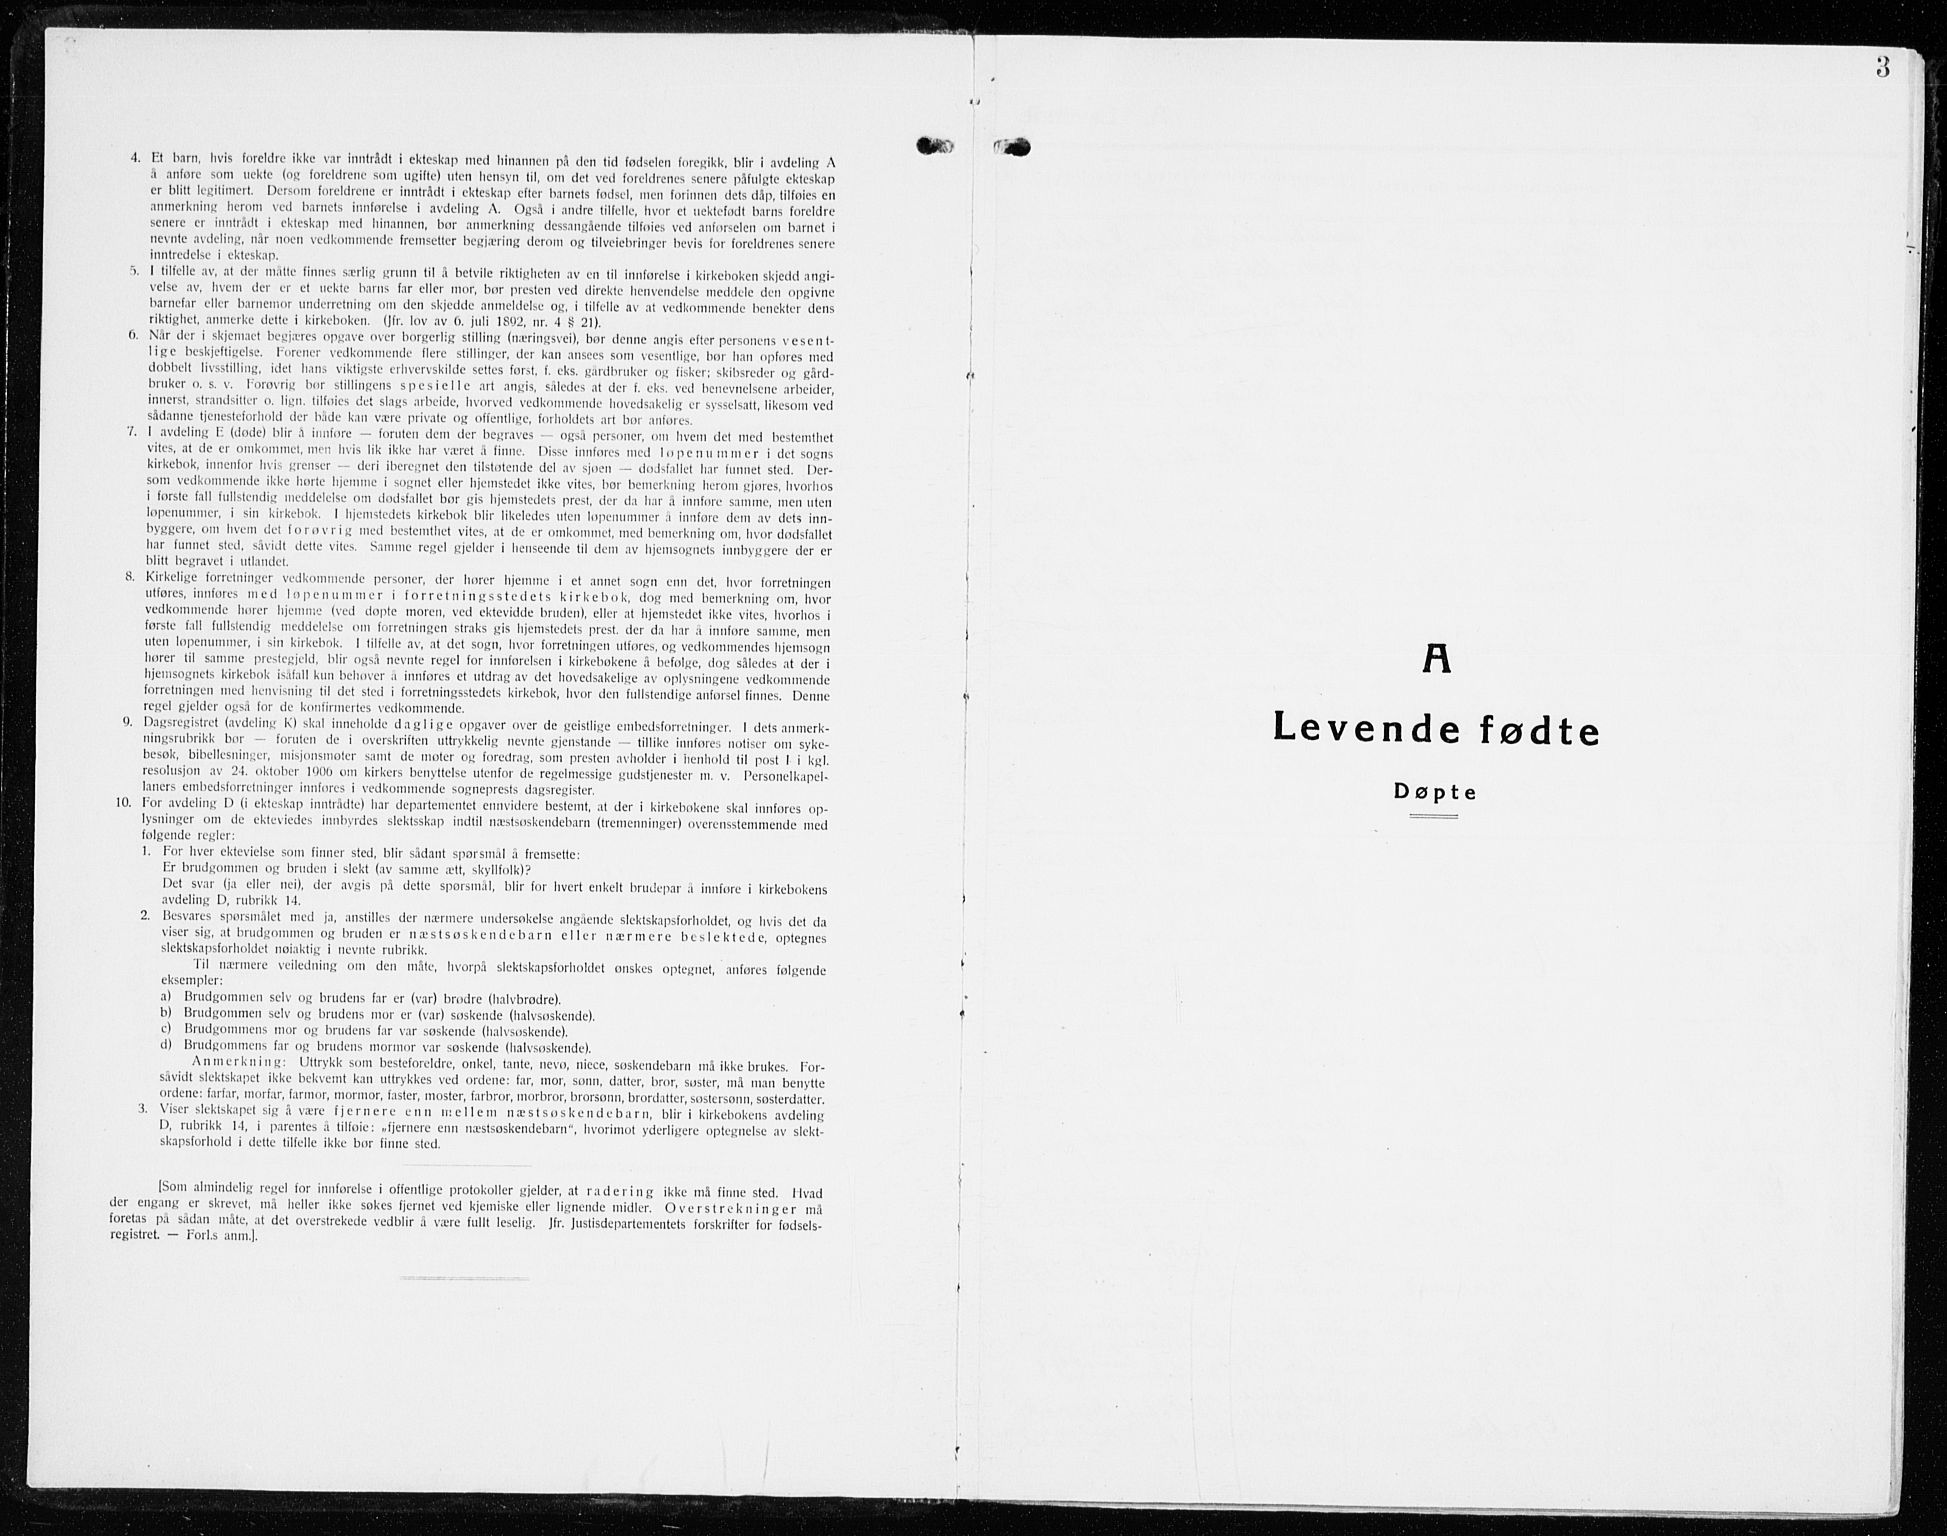 SAH, Vardal prestekontor, H/Ha/Haa/L0018: Ministerialbok nr. 18, 1930-1945, s. 3